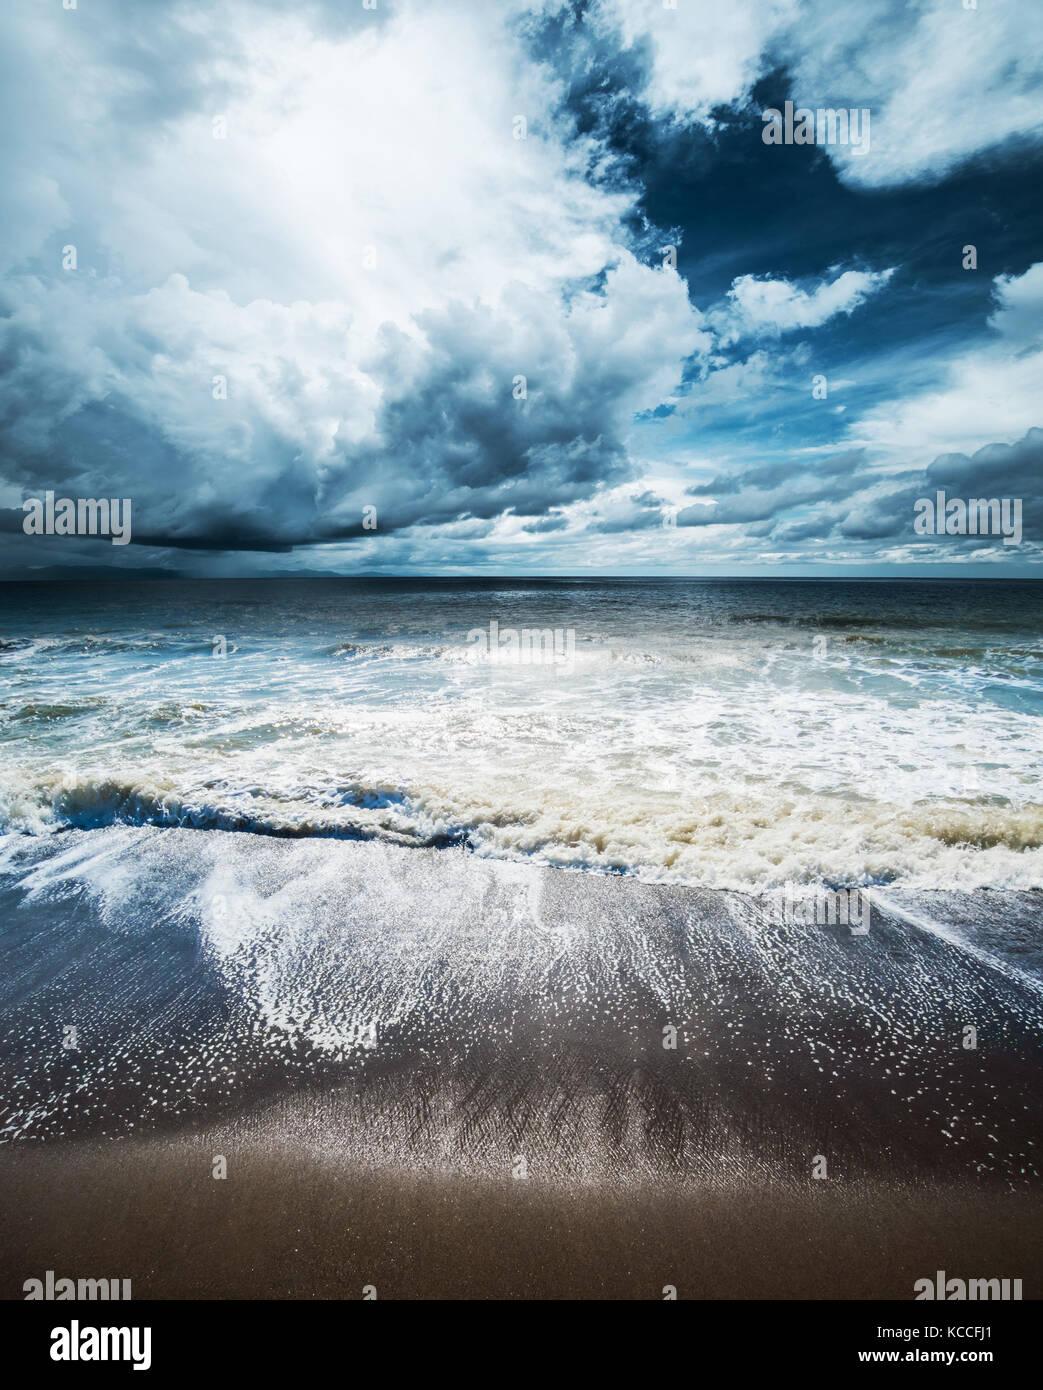 Sea storm landscape - Stock Image